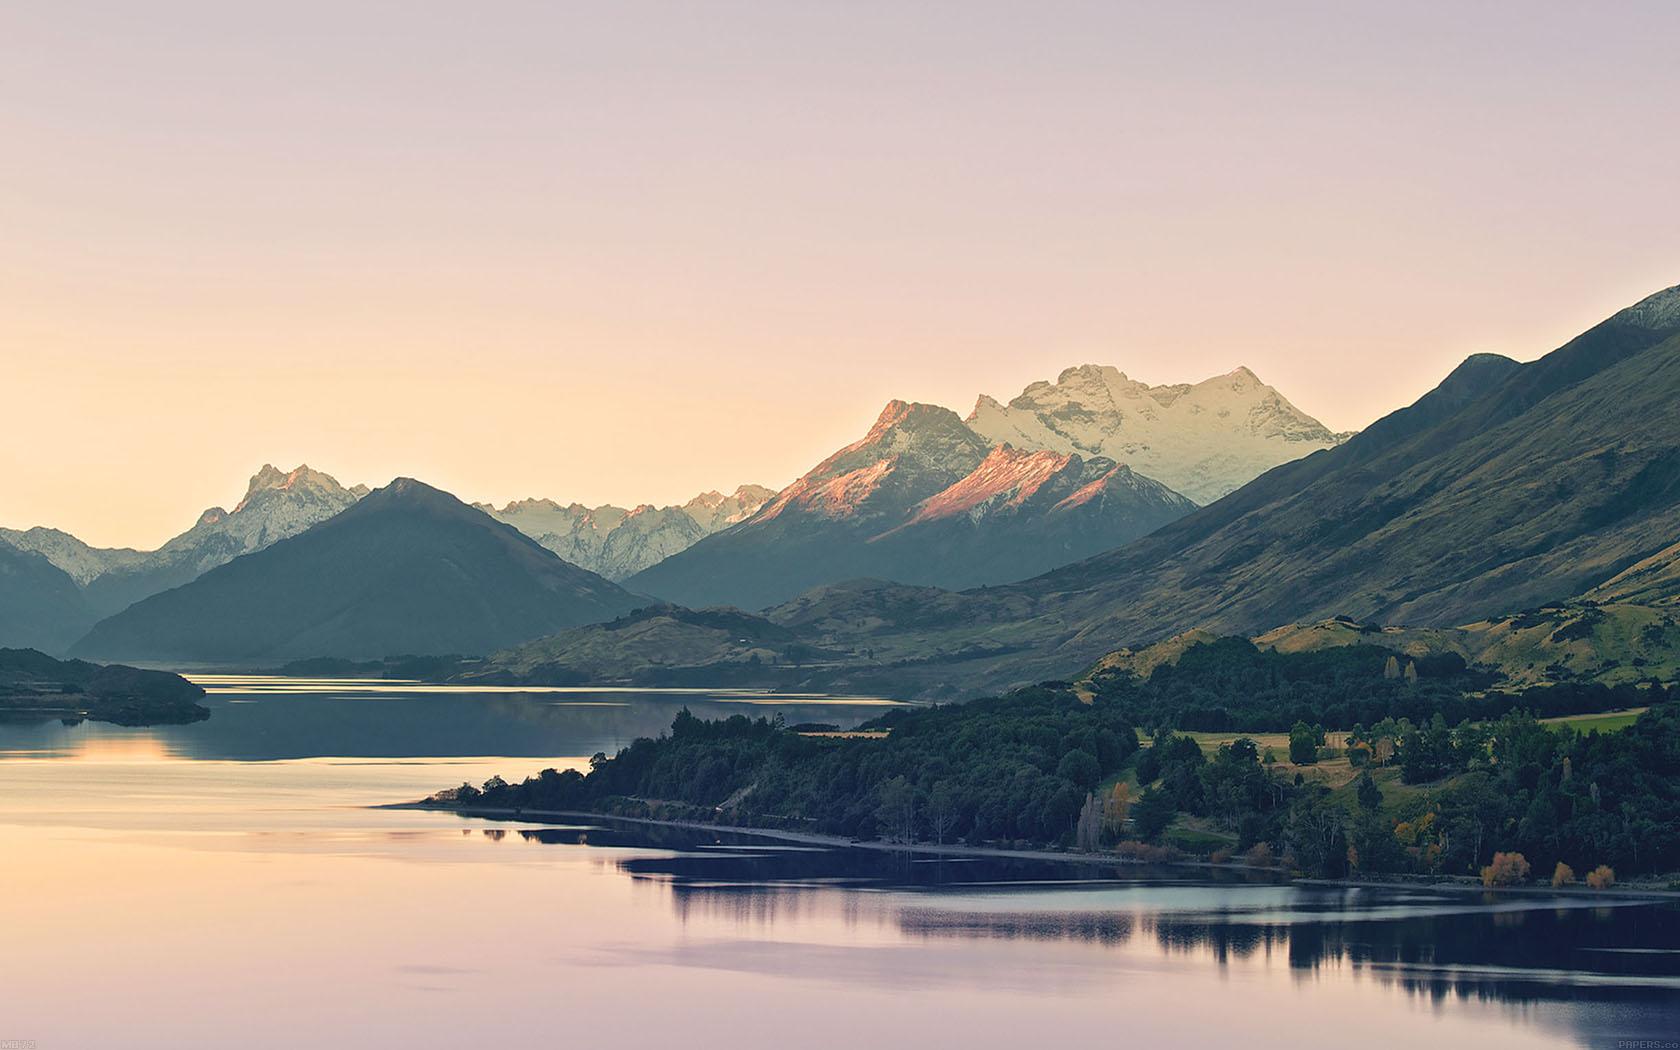 New Zealand Wallpaper Iphone X Wallpaper For Desktop Laptop Mb72 Wallpaper Vanilla Sky